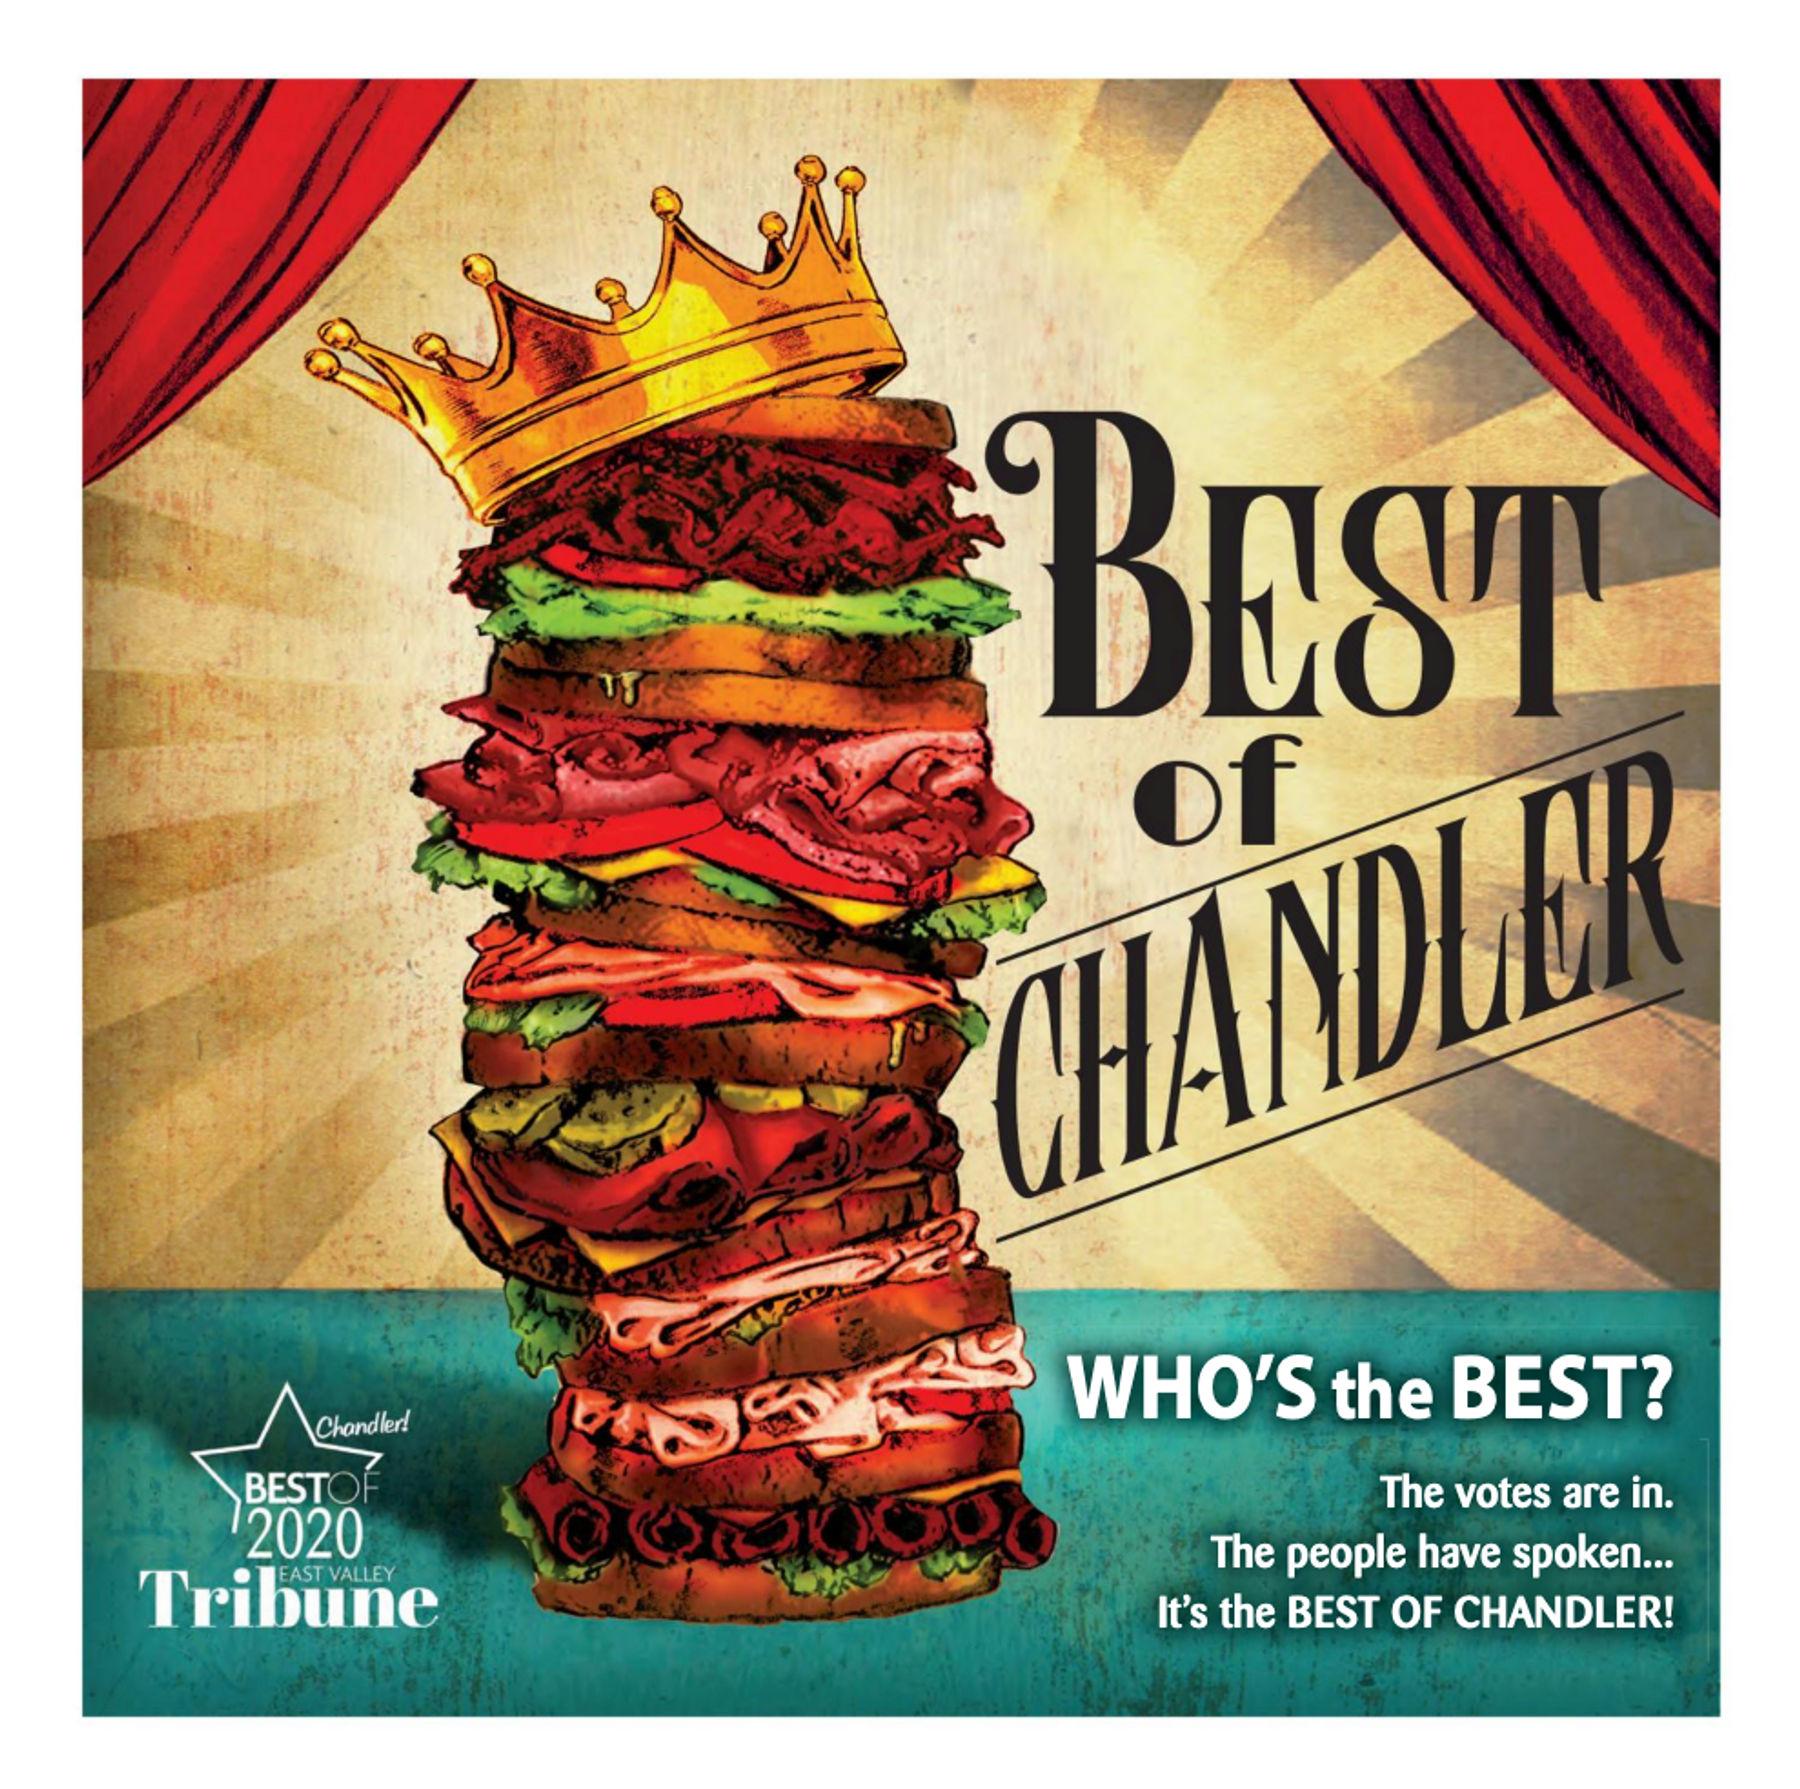 Best of Chandler Awards